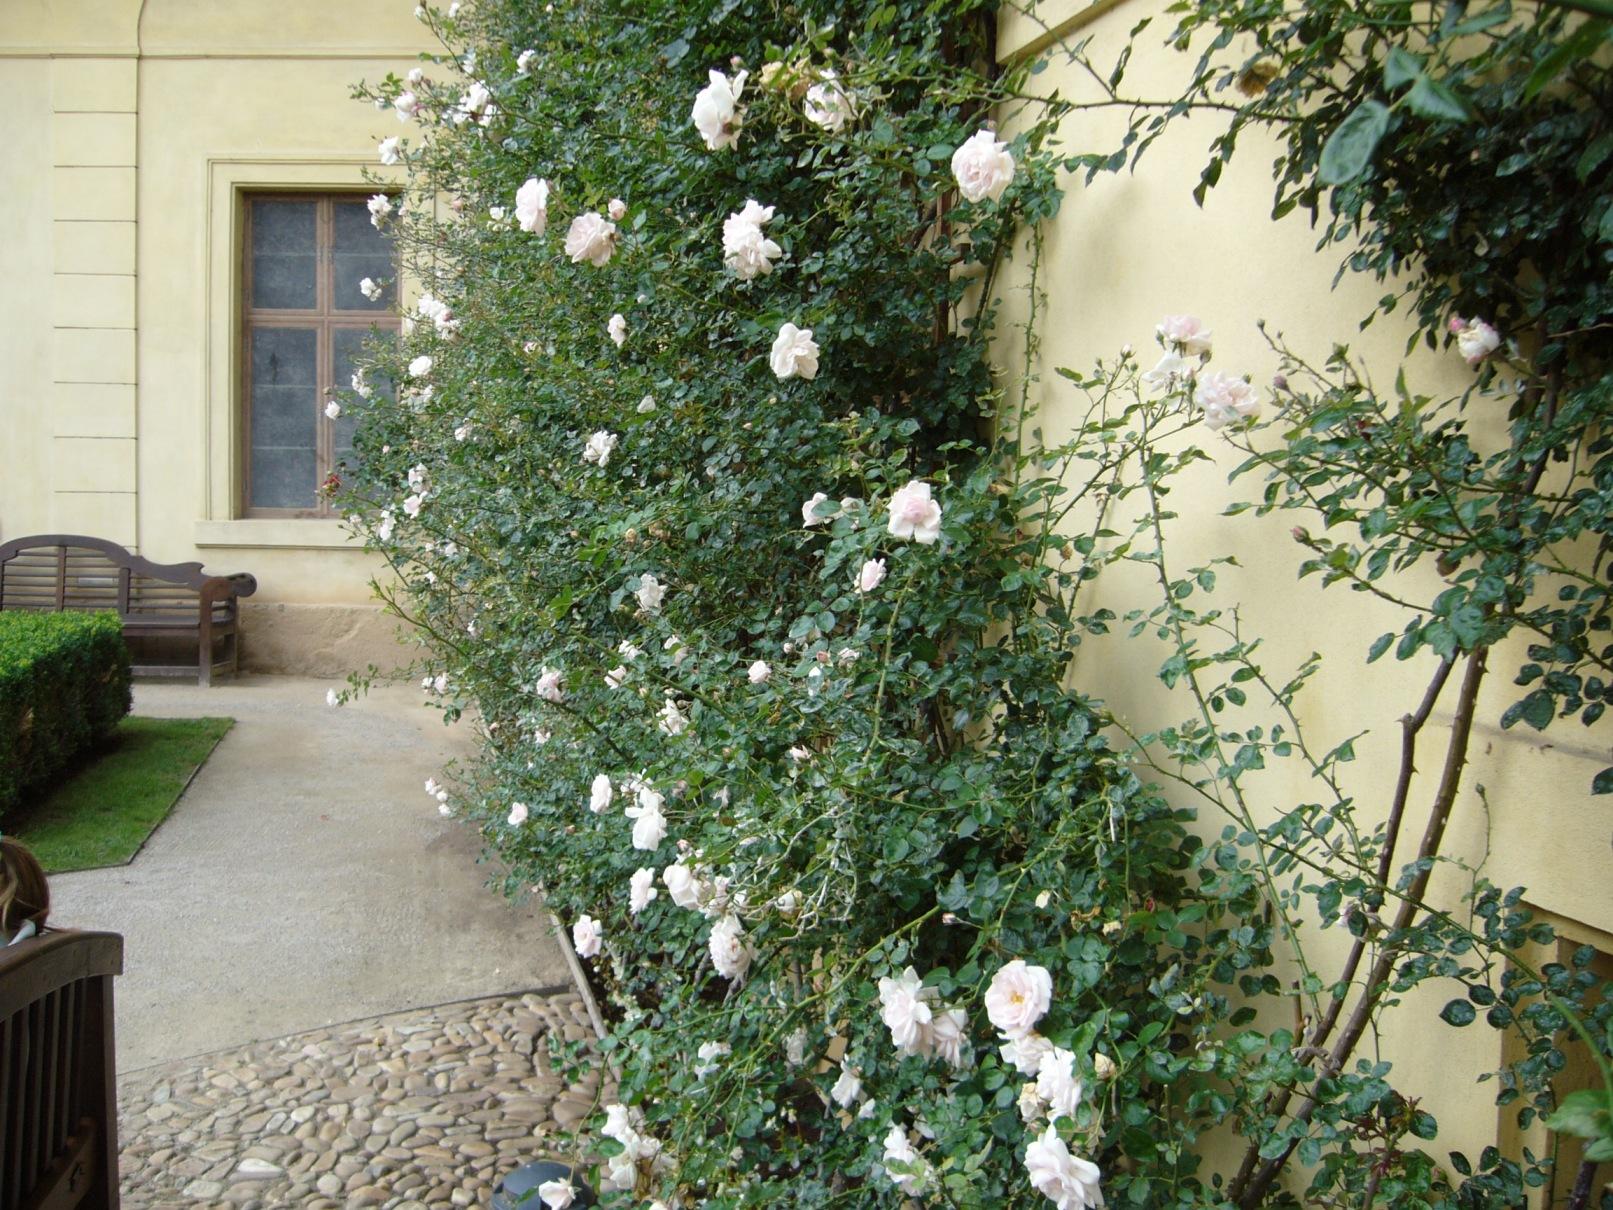 Vrtbovská zahrada - popínavé růže